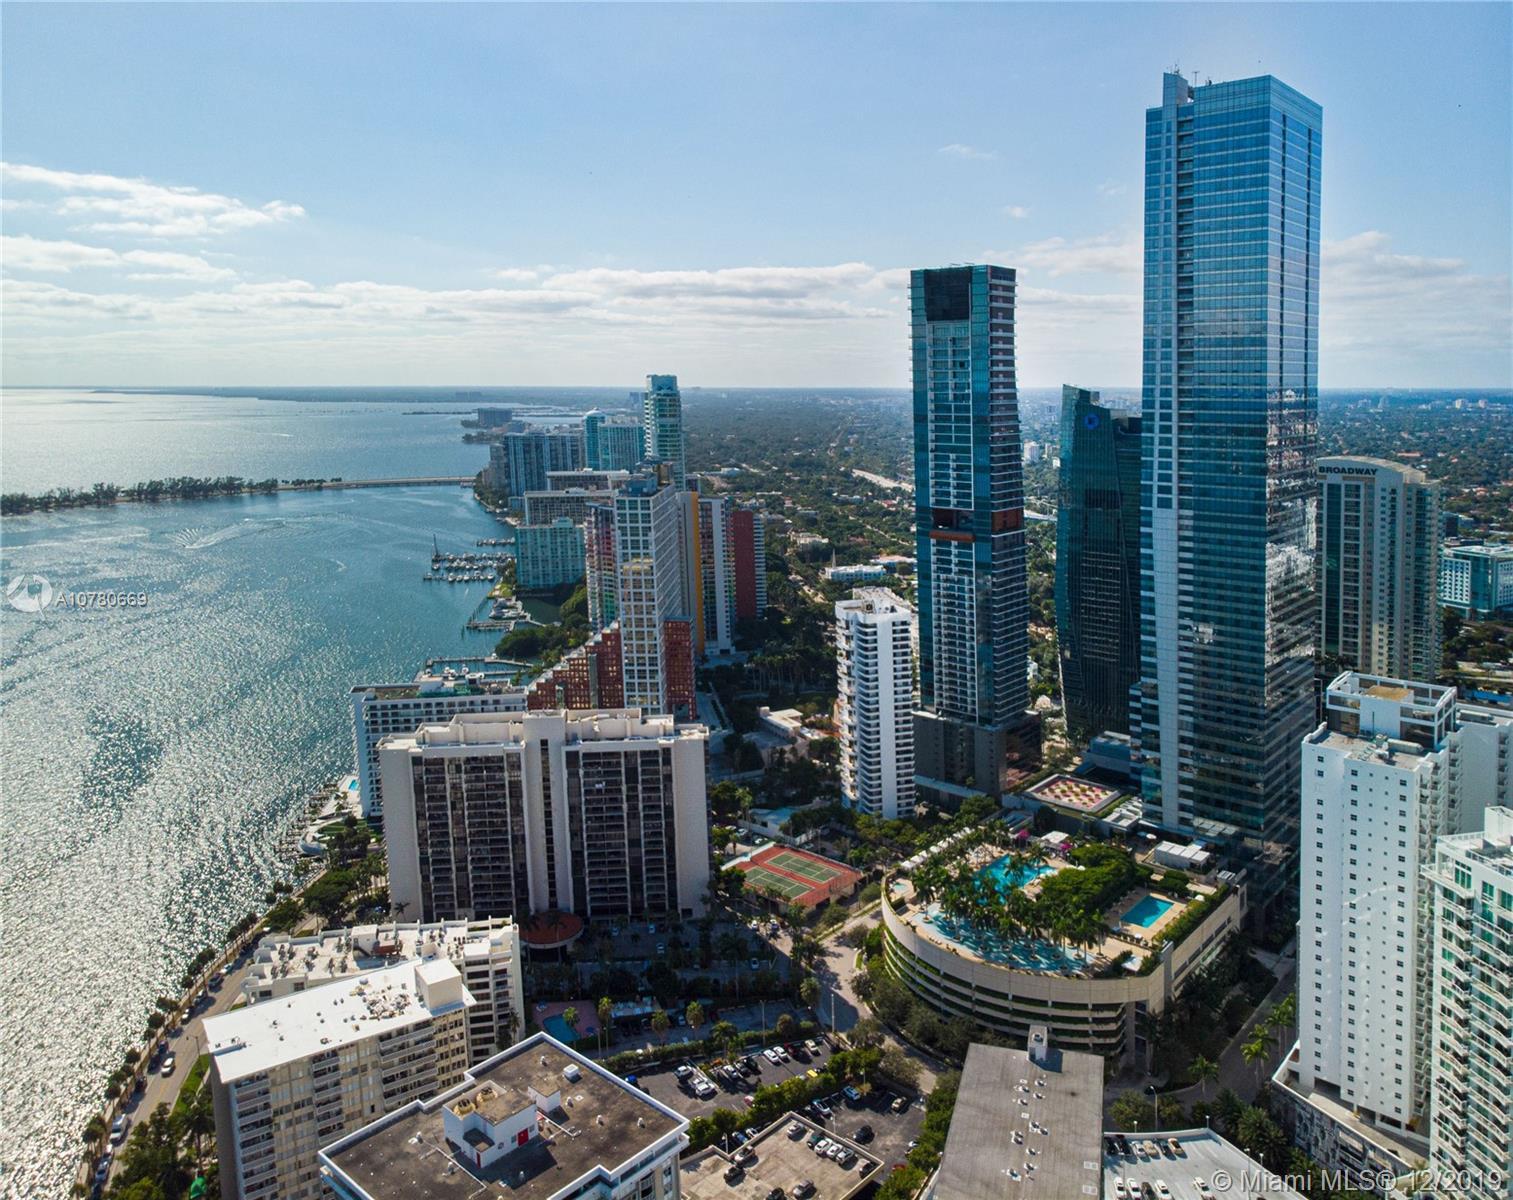 1425 Brickell Ave, 52D - Miami, Florida